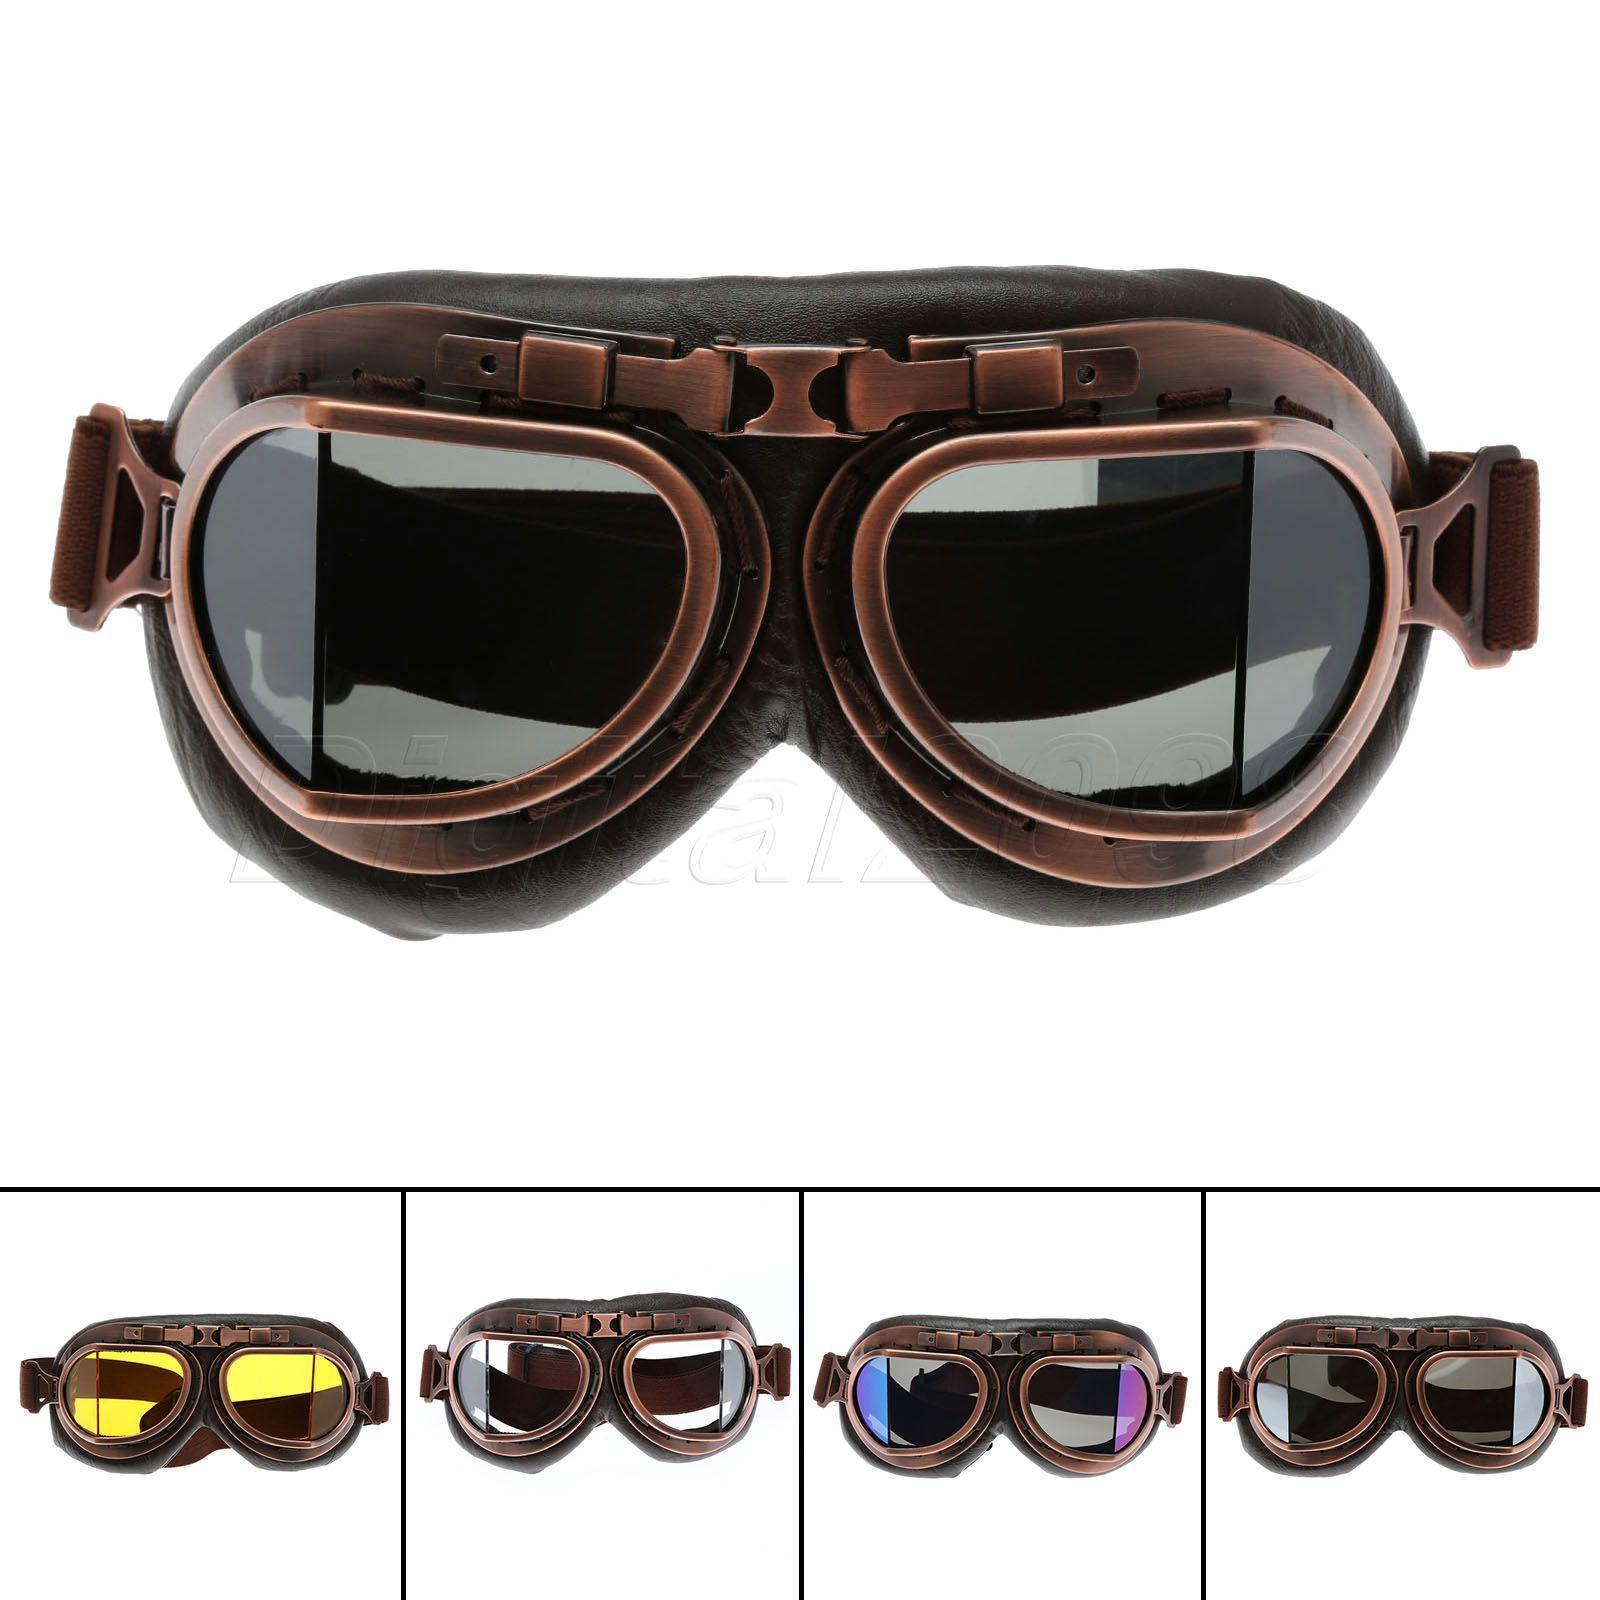 Yetaha WWII RAF Vintage Motorcycle Goggles Harley Motocross Aviator Pilot <font><b>Cruiser</b></font> Glasses ATV Dirt Bike Motor Helmet 5 Colors